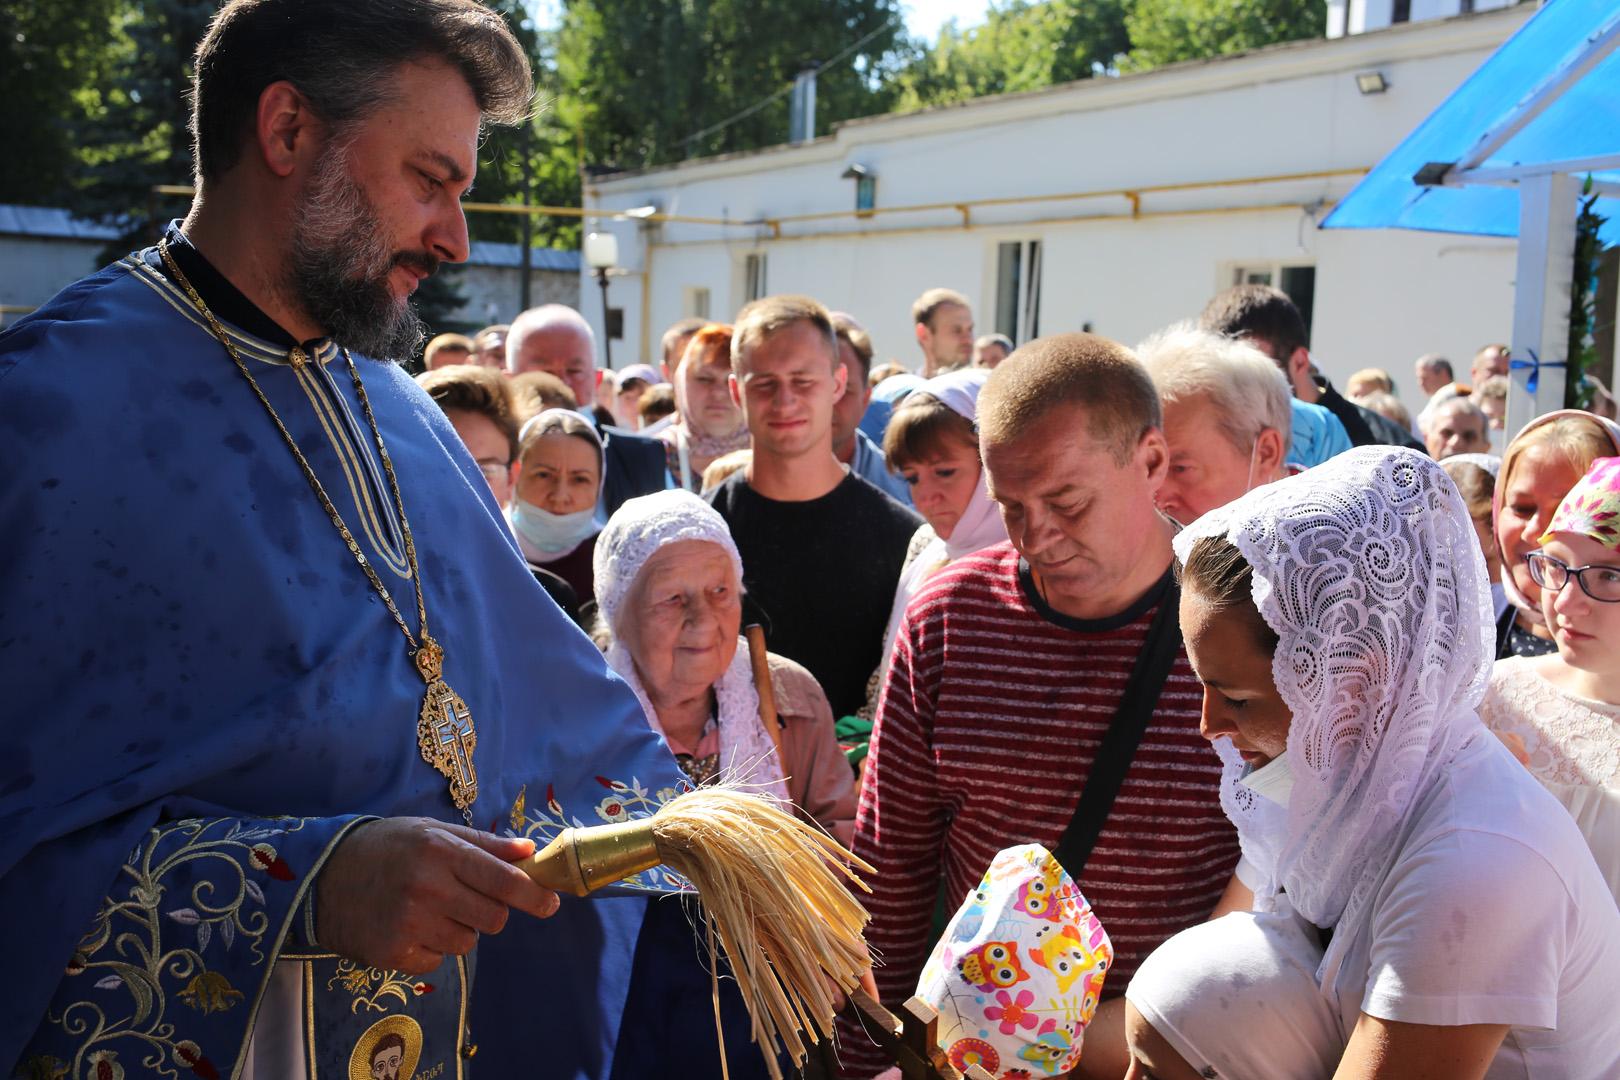 http://monuspen.ru/photoreports/c921fa66433a9104090f5865f55396av.jpg